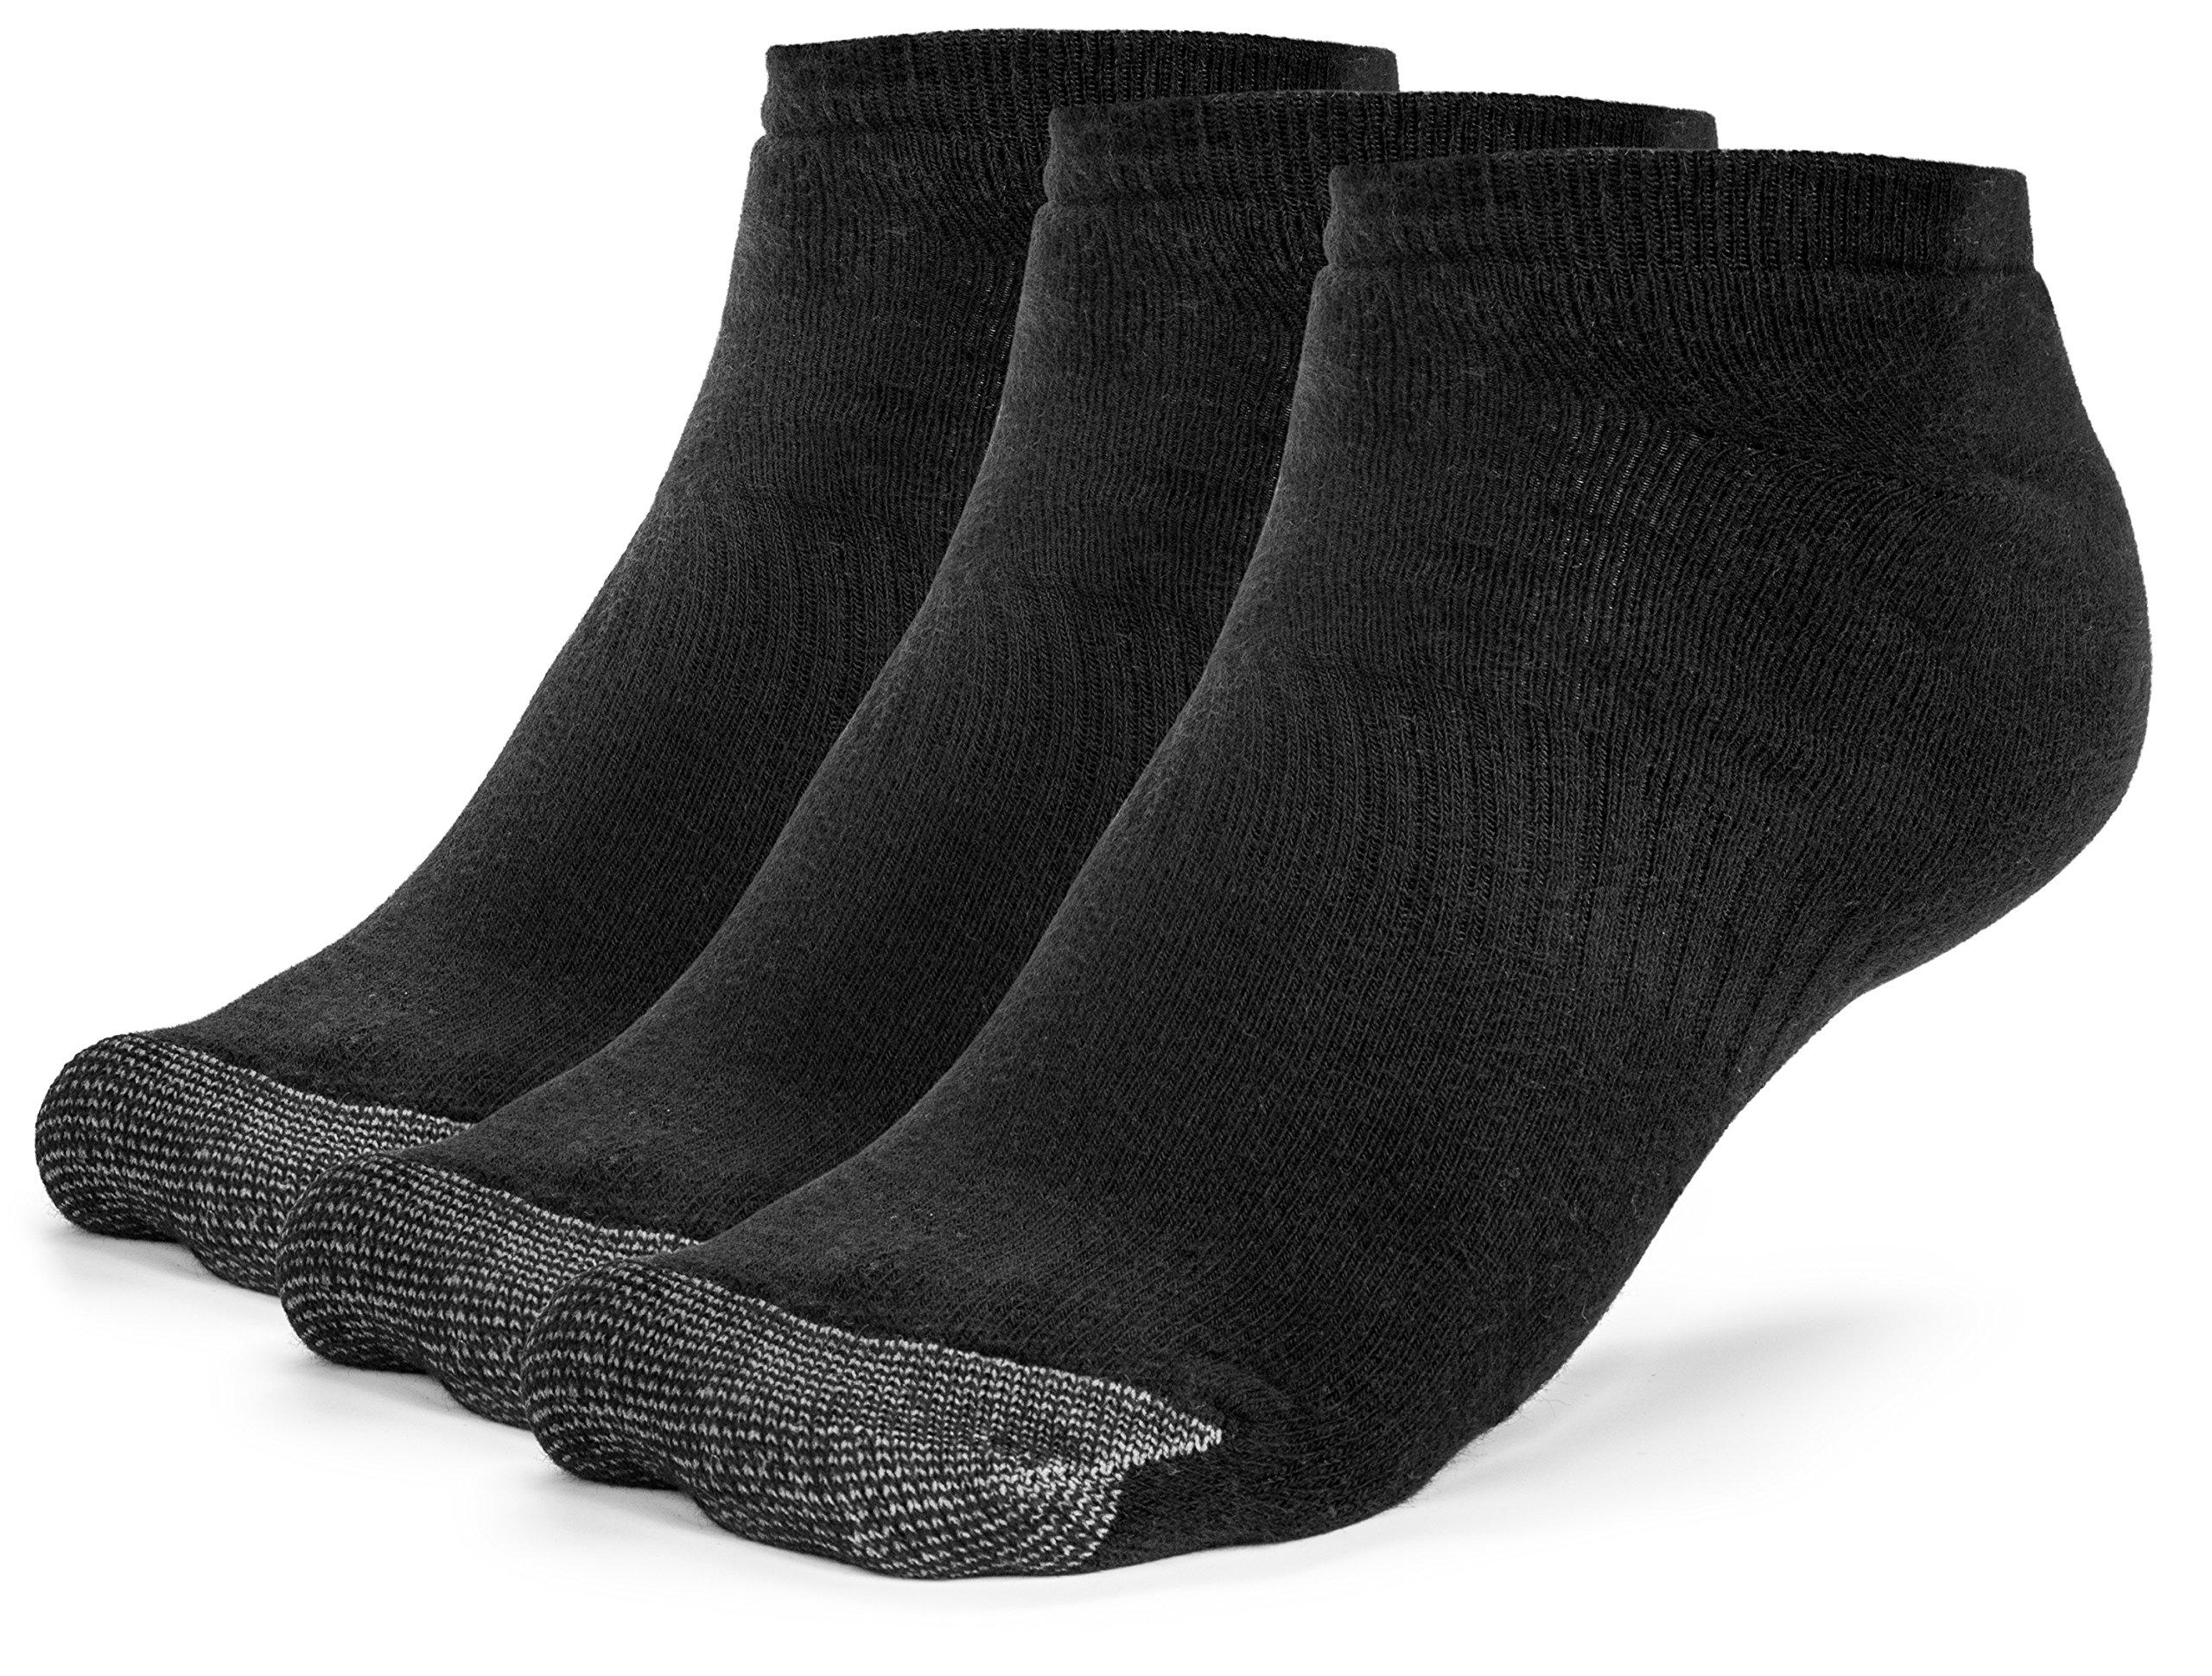 Galiva Men's Cotton Extra Soft Low Cut Cushion Socks - 3 Pairs, Medium, Black